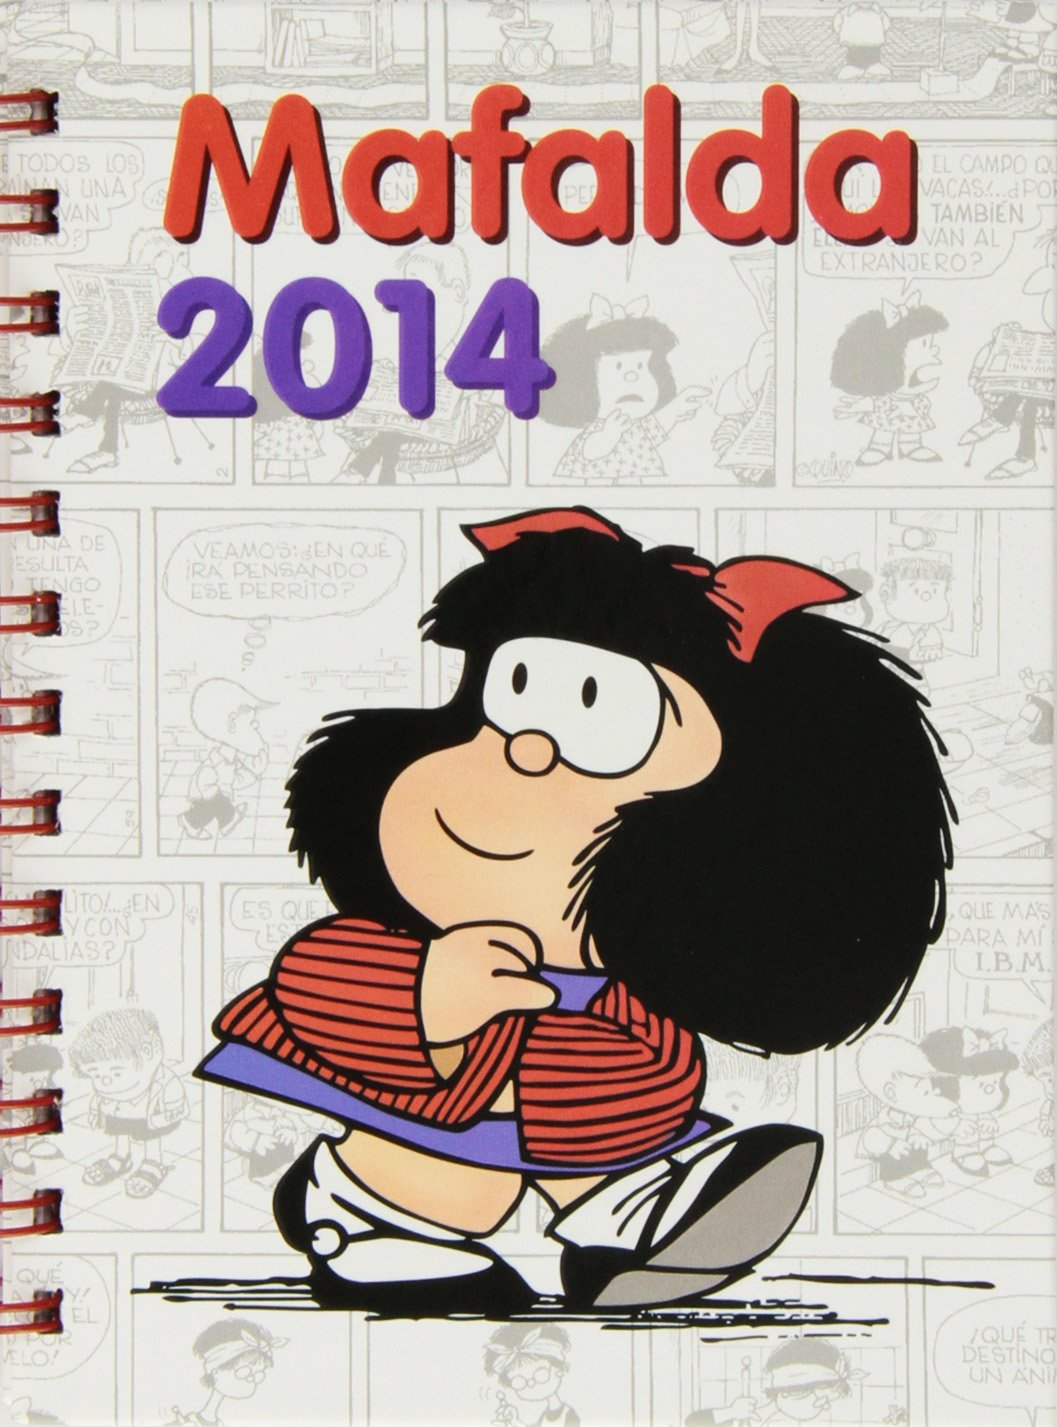 Agenda Anillada 2014. Mafalda: Amazon.es: Vv.Aa.: Libros